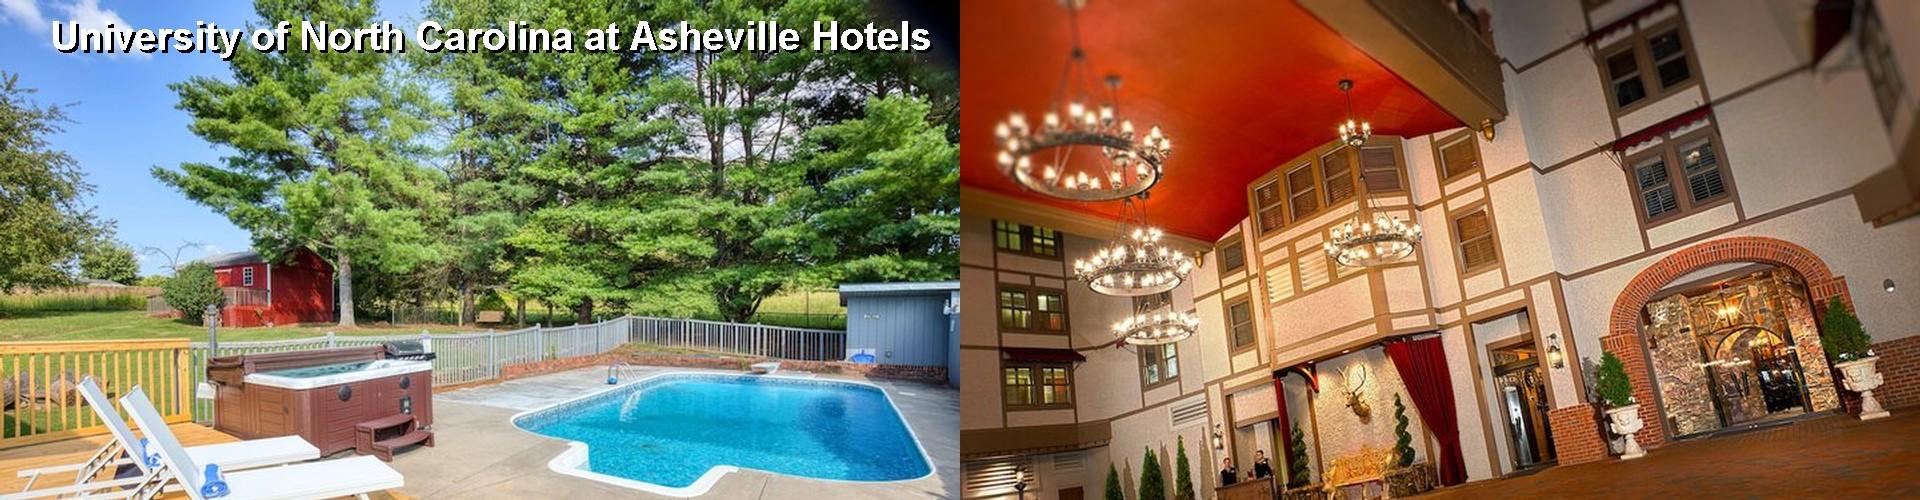 5 Best Hotels Near University Of North Carolina At Asheville